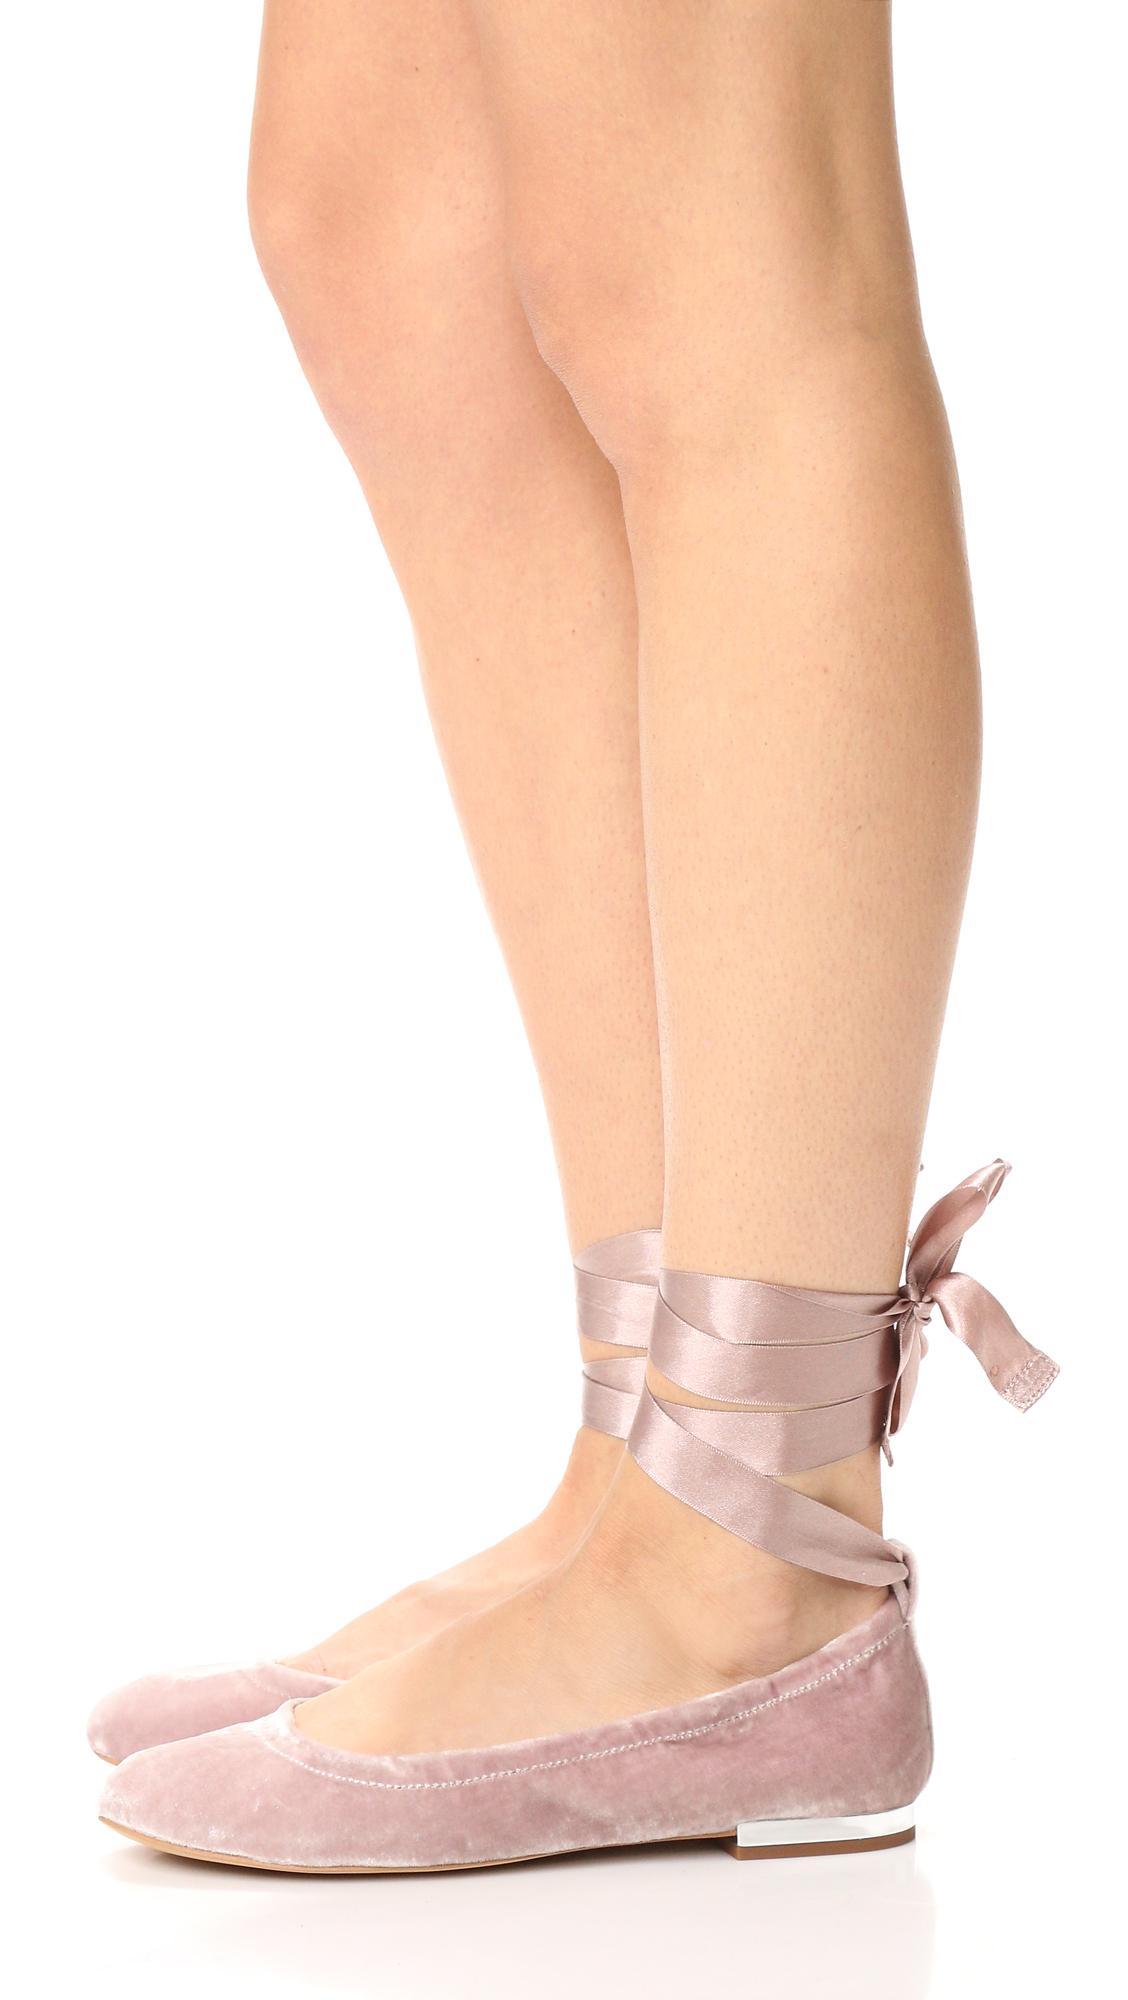 b762d3f58 Lyst - Sam Edelman Velvet Fallon Ballet Flats in Pink